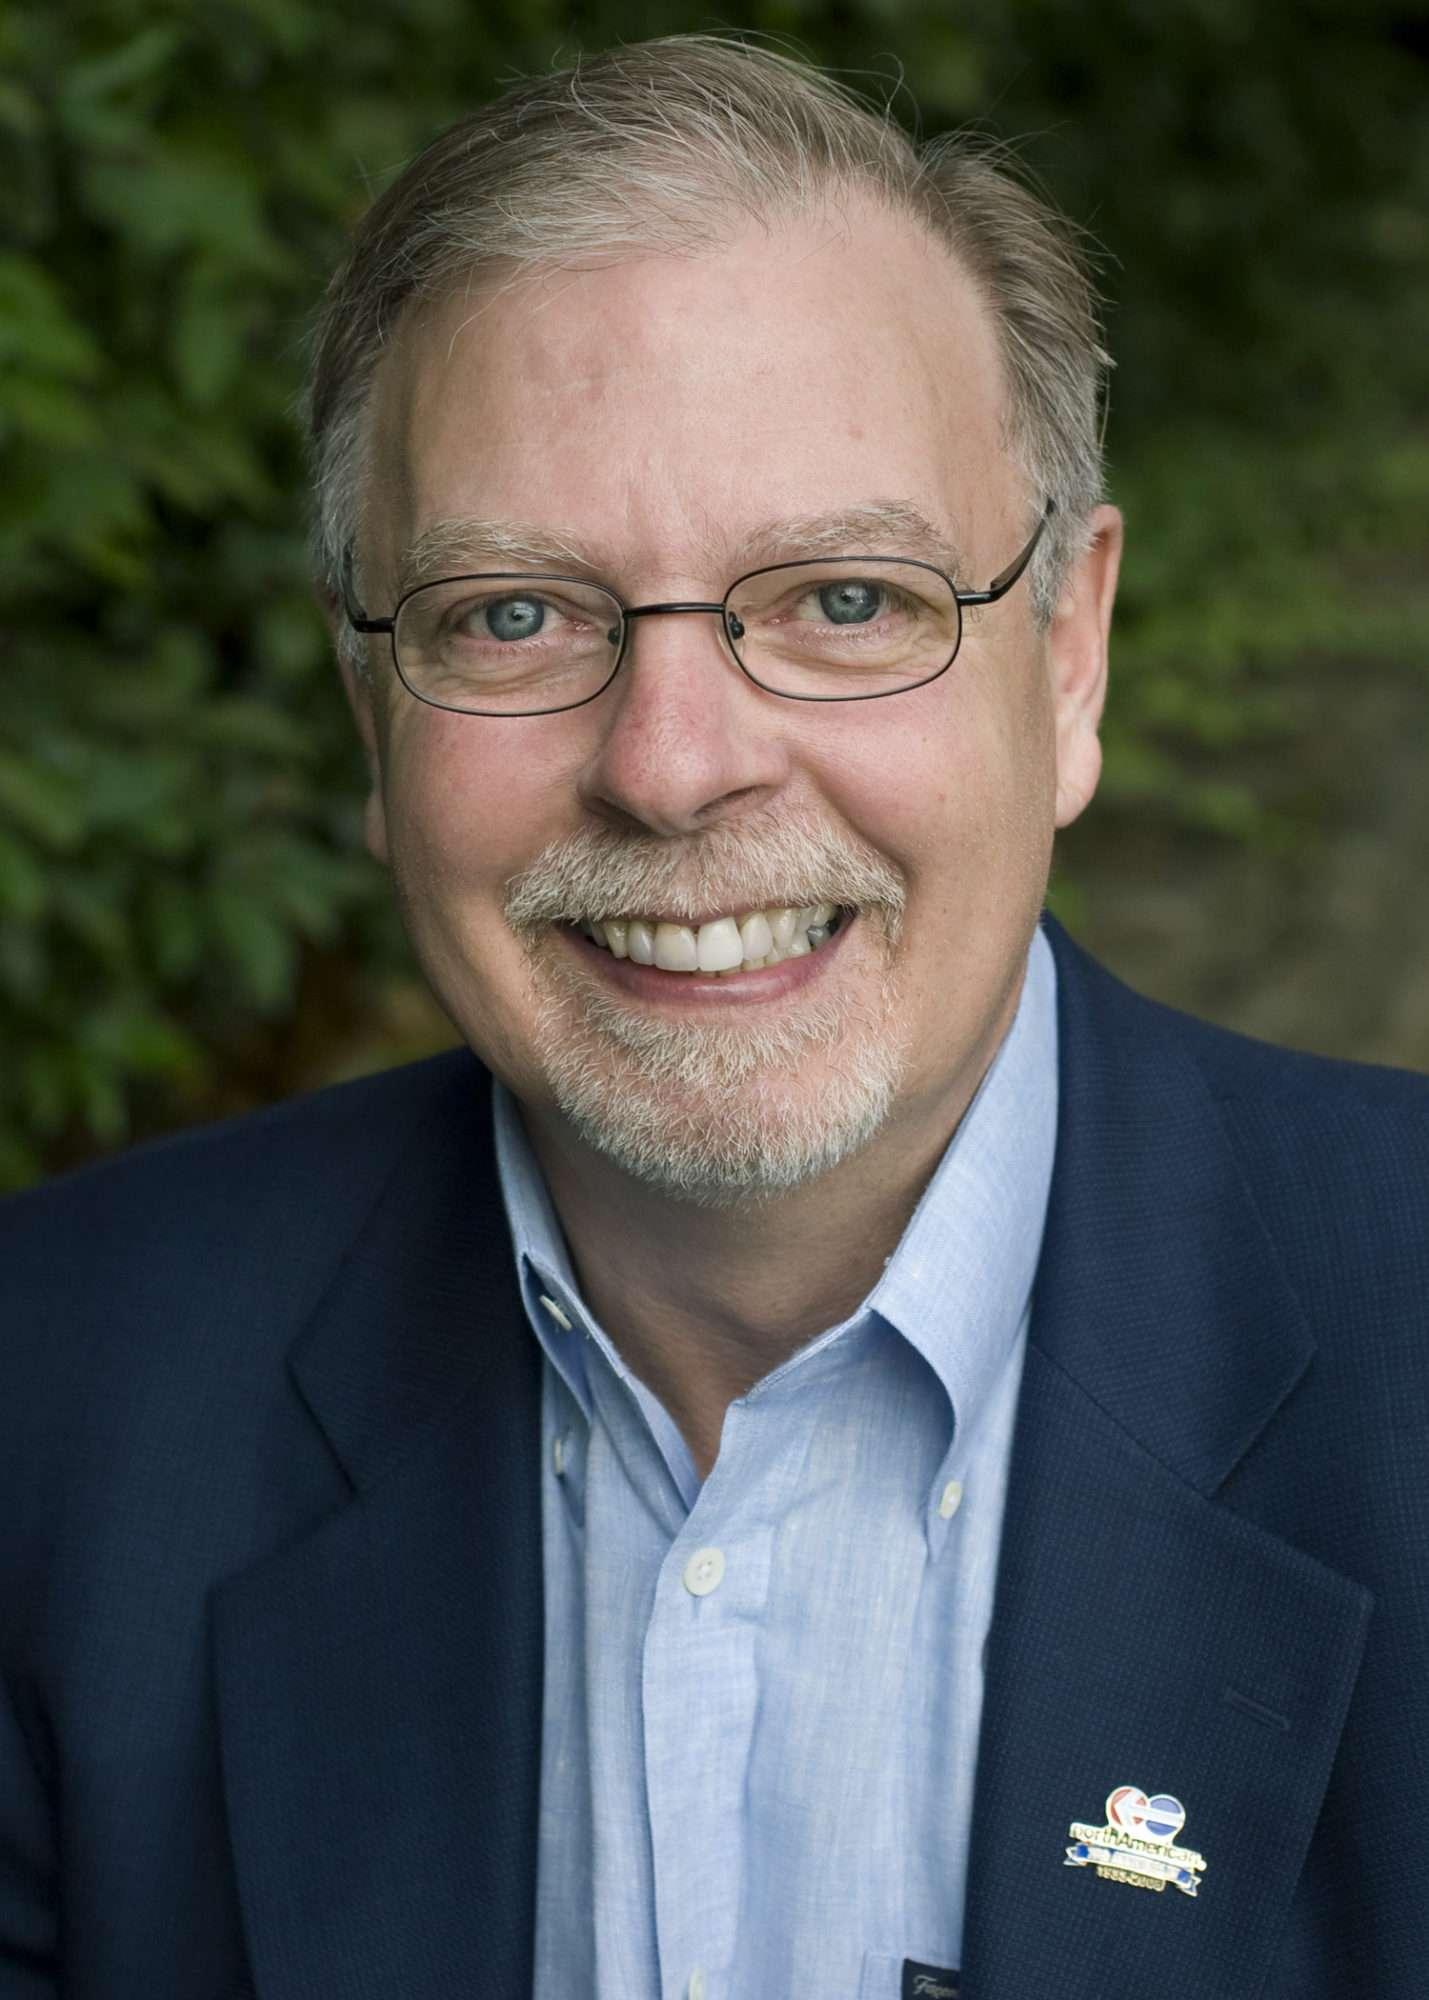 Profile picture of Lile VP of Sales,Dan DeAutremont